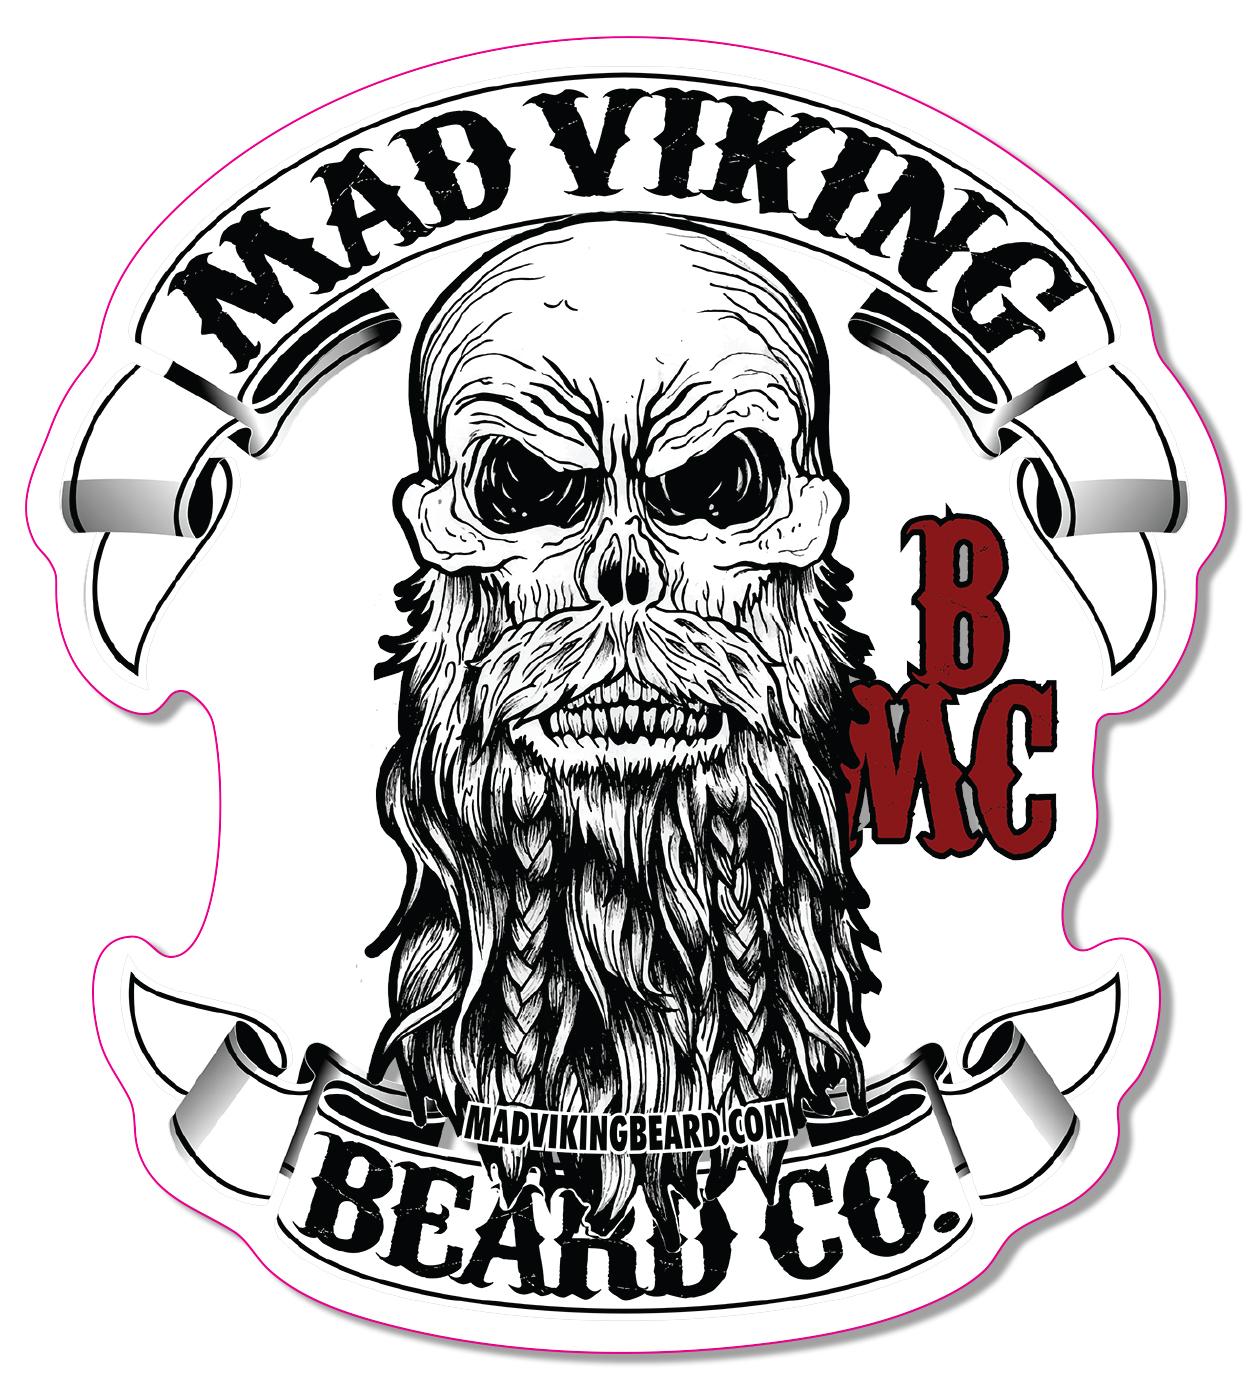 Mad logo sticker x. Beard clipart viking beard